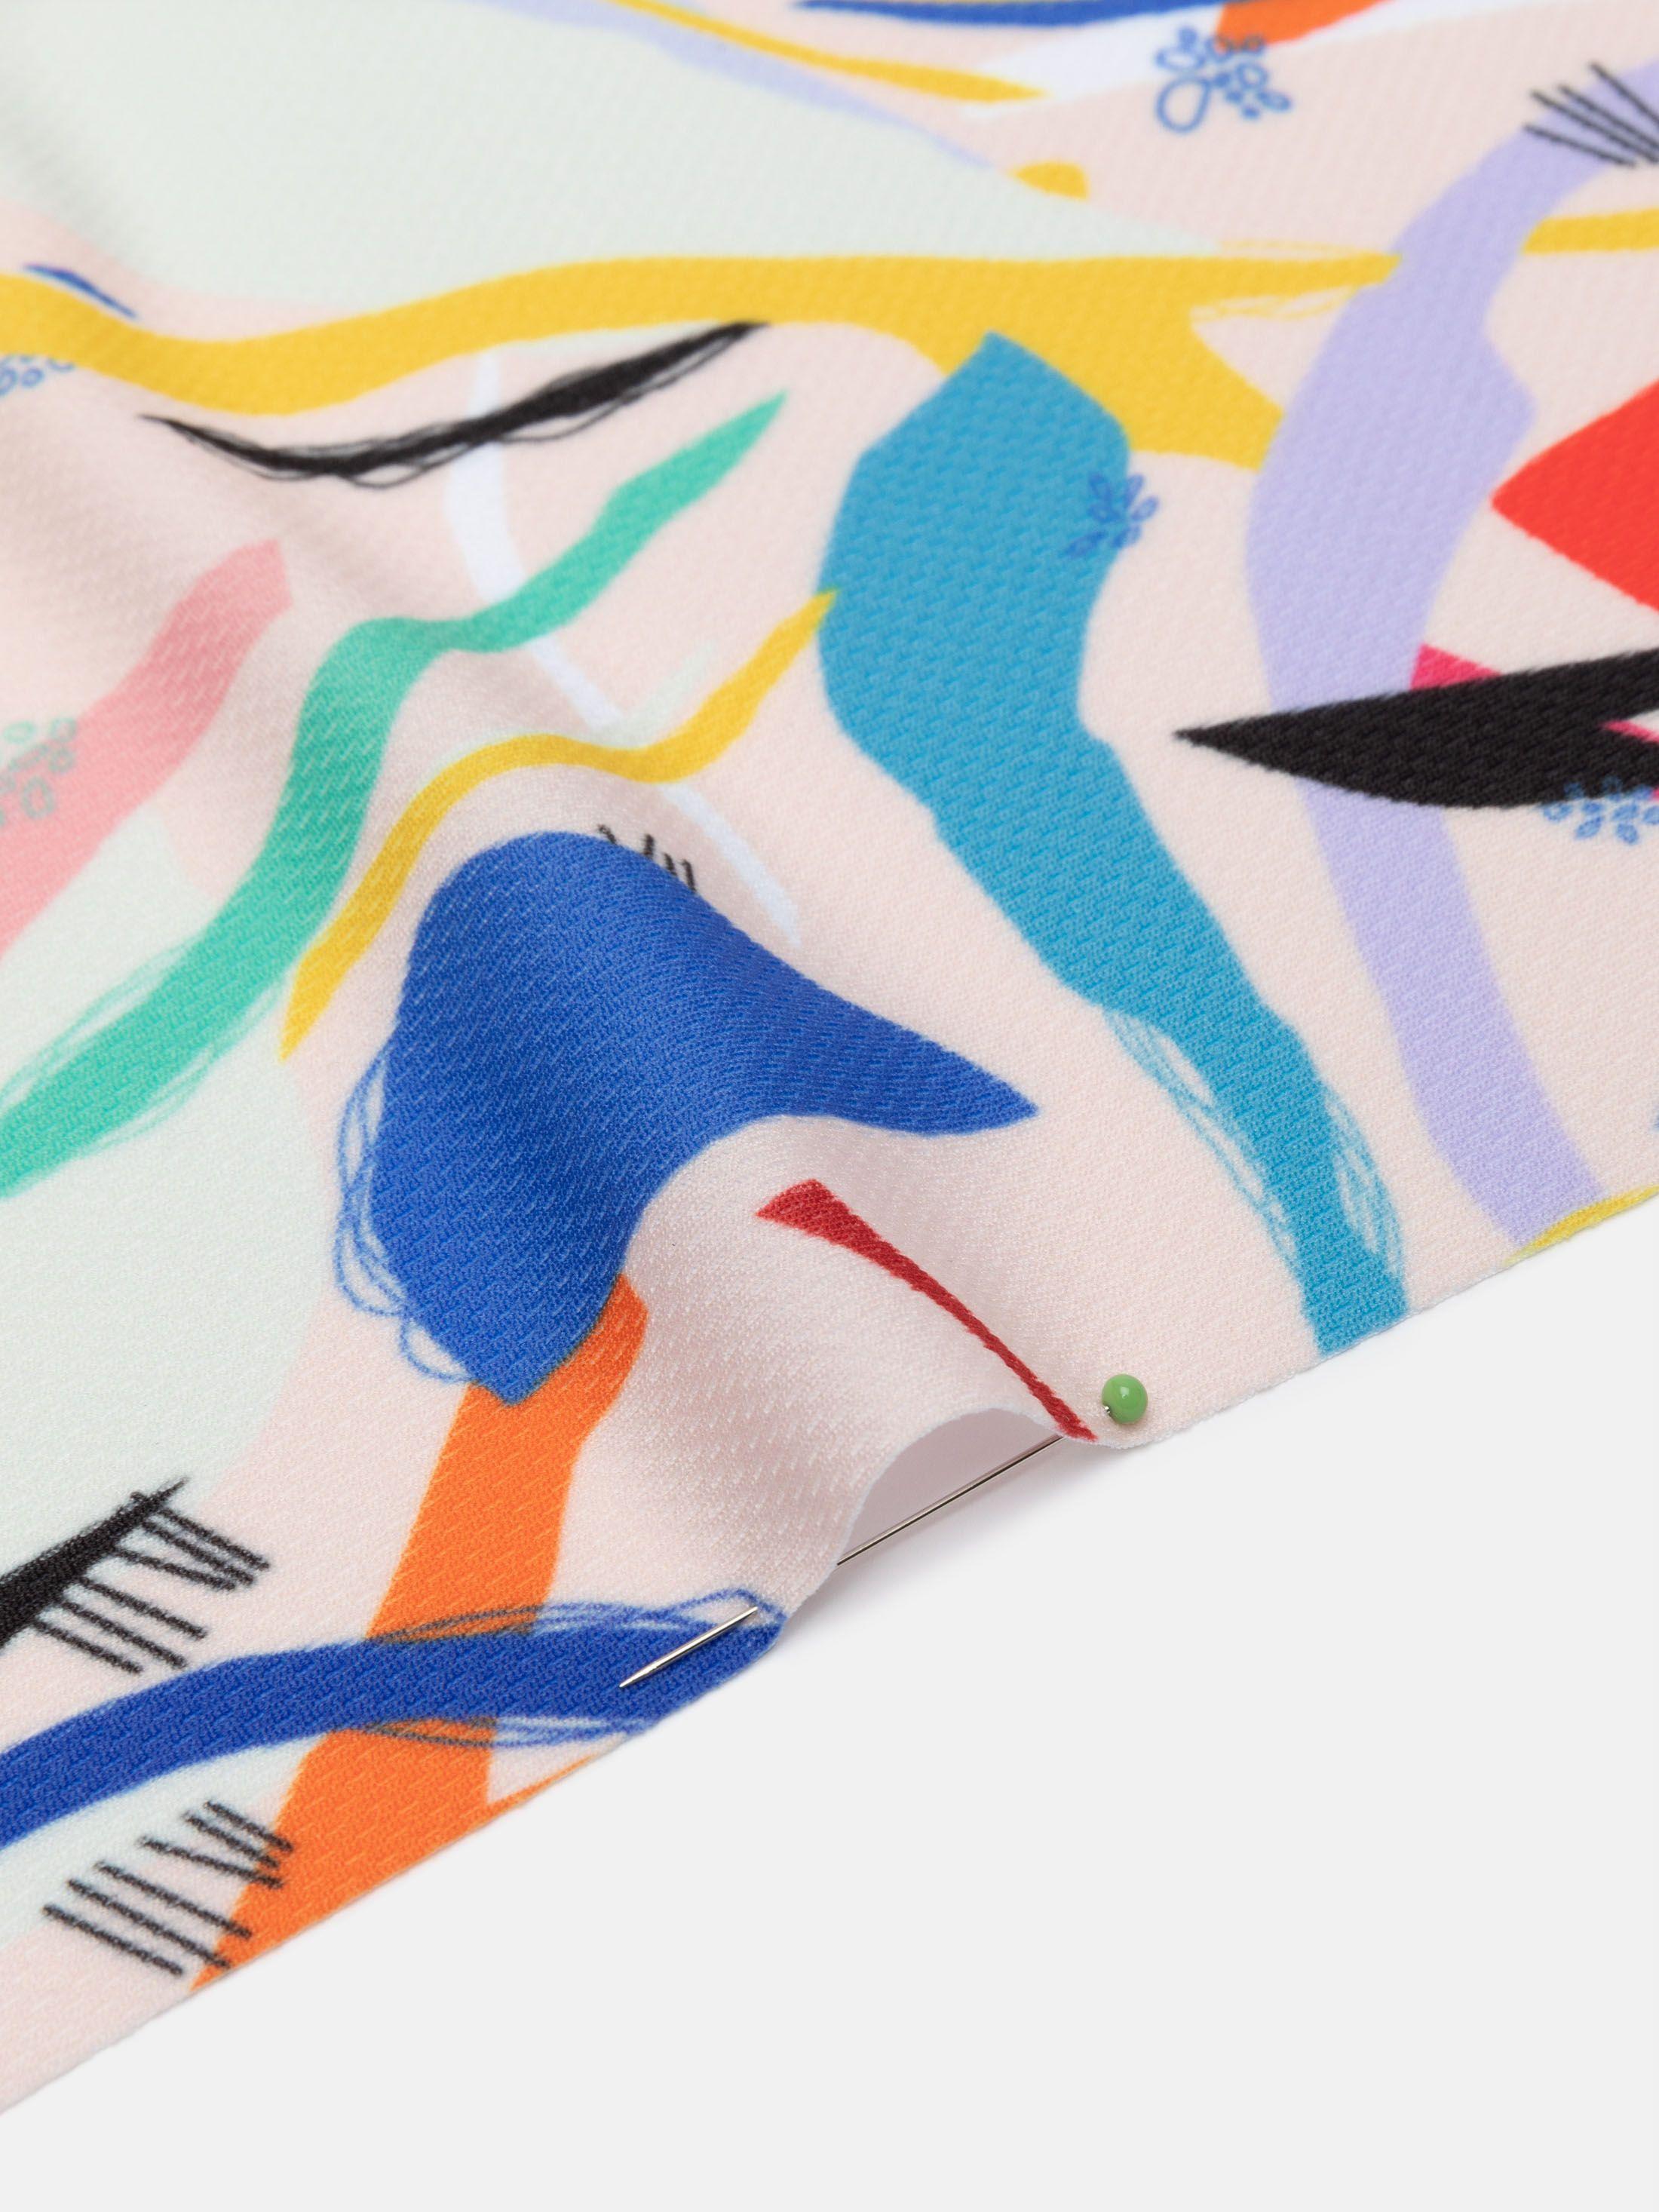 Custom Printing on Airflow Light Fabric